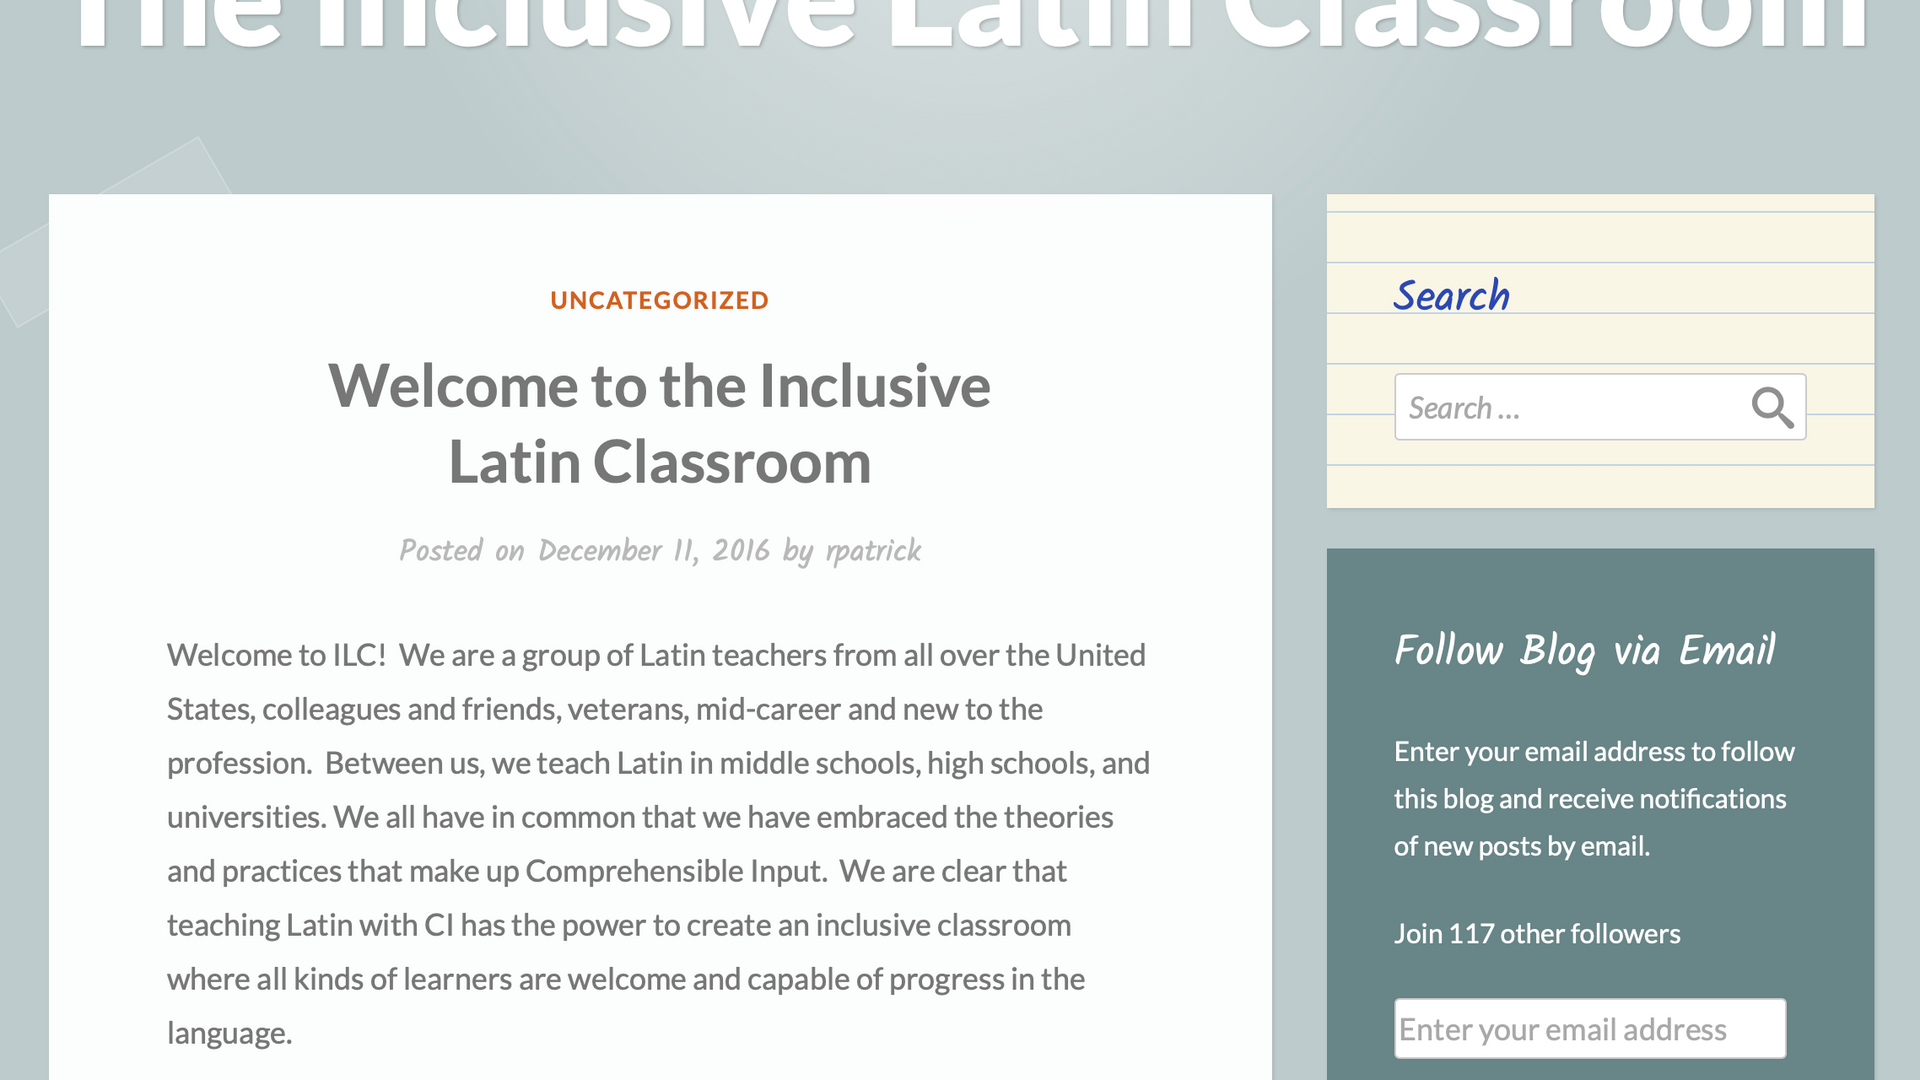 The Inclusive Latin Classroom